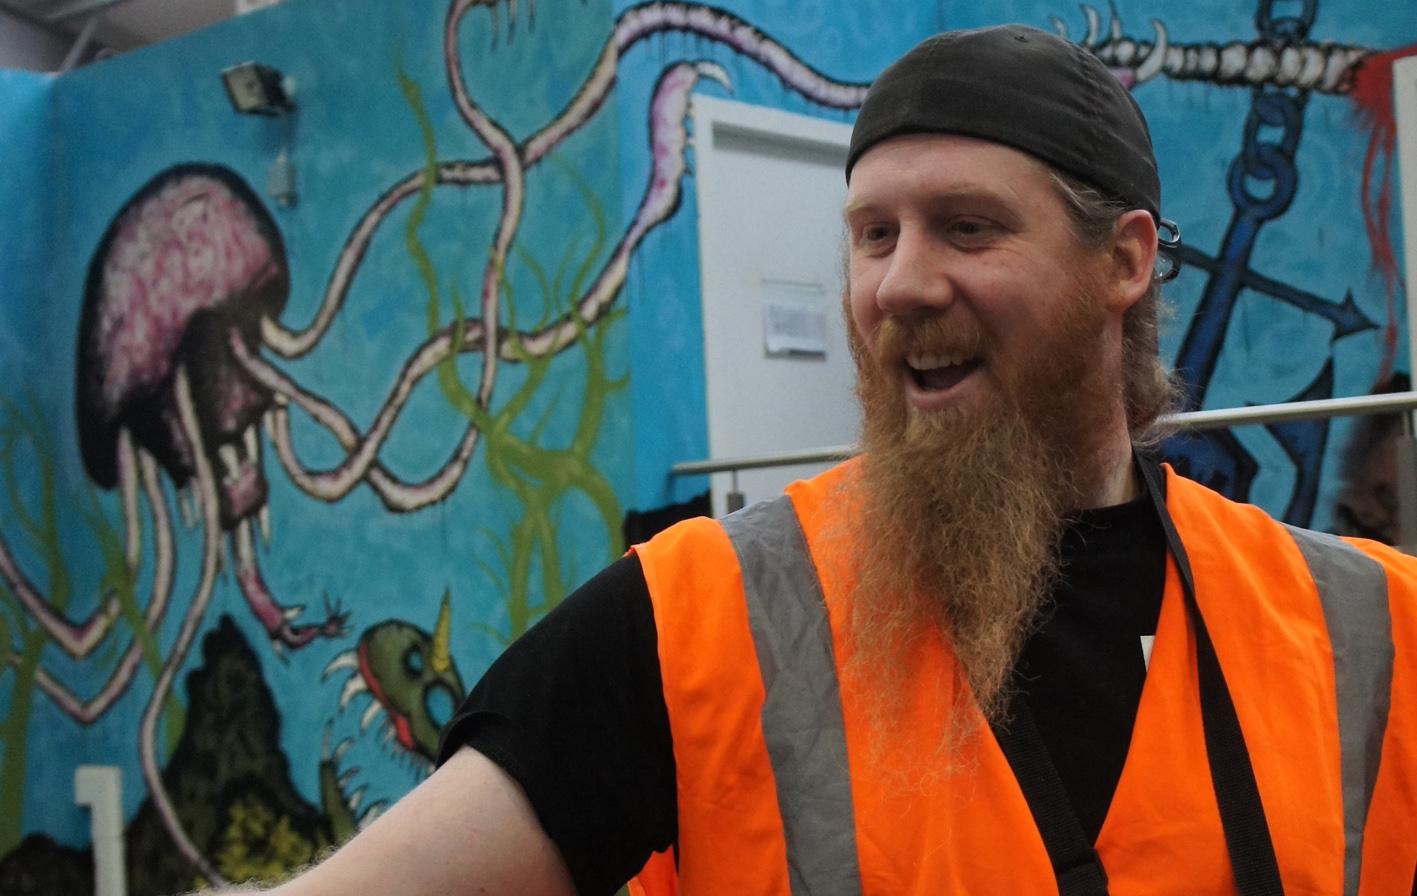 BrewDog's head brewer, Stewart Bowman, with obligatory American Brewer's Beard